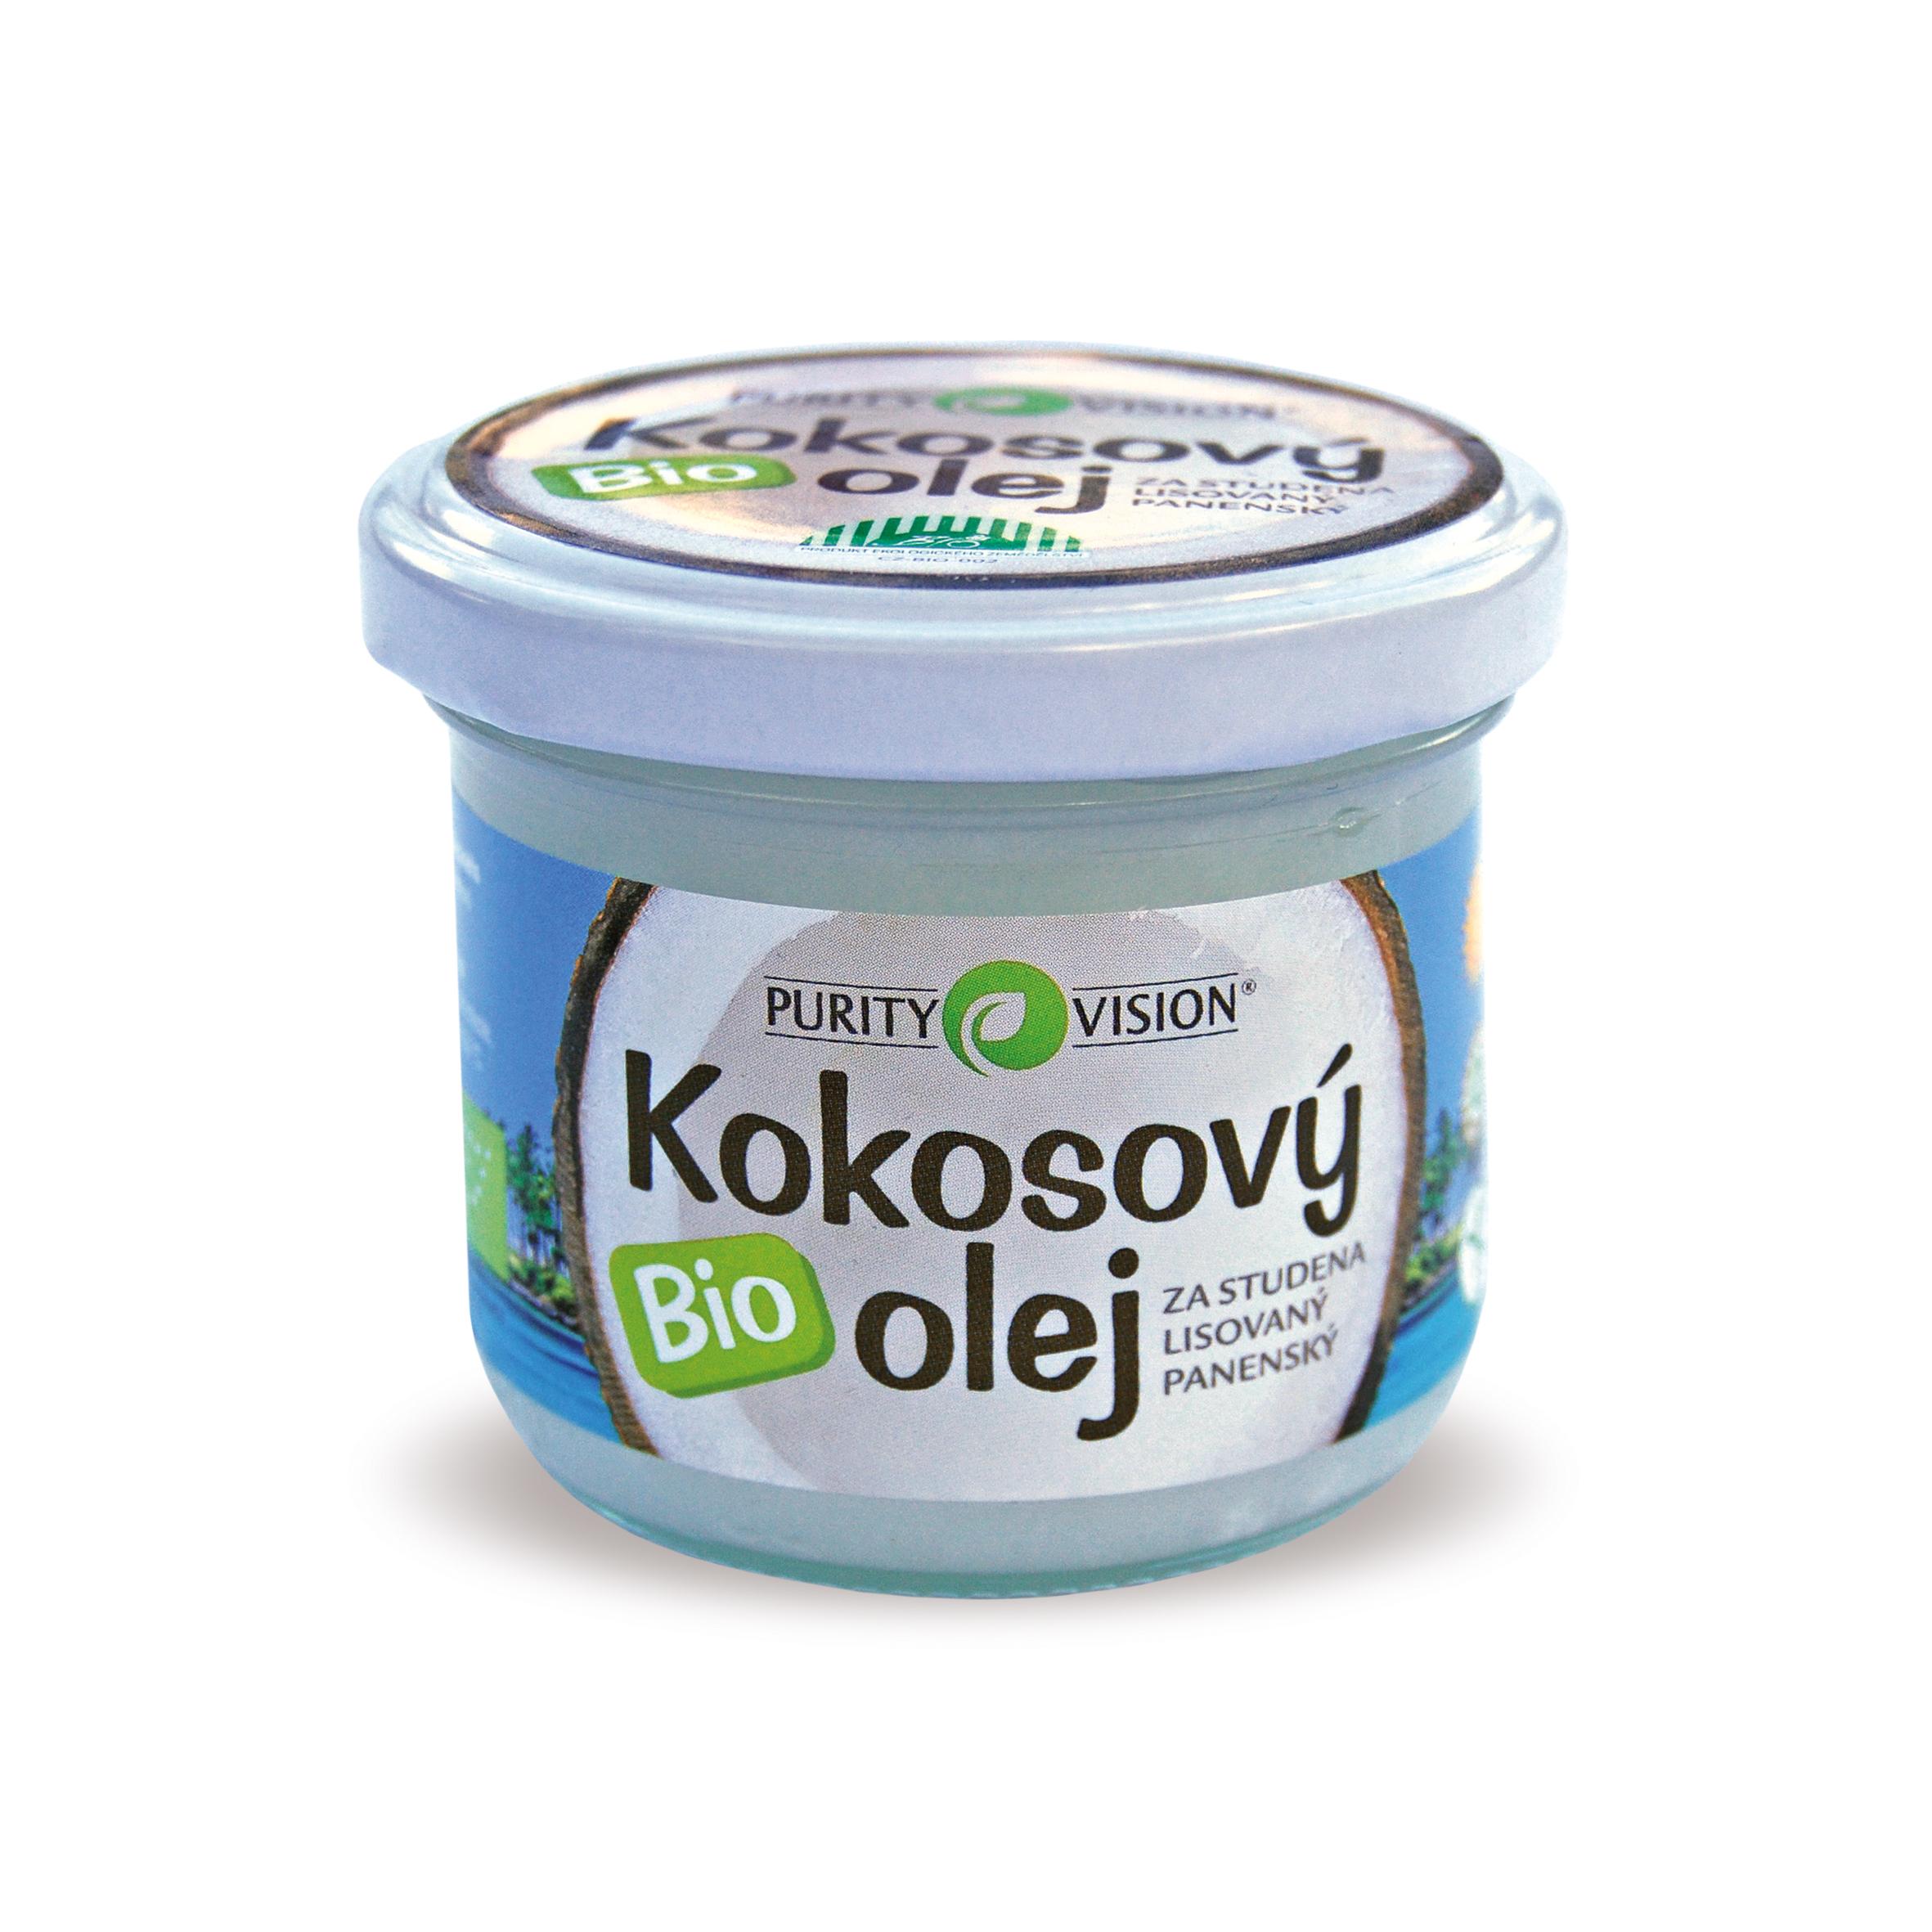 Purity Vision BIO Panenský kokosový olej 100 ml + výdejní místa po celé ČR